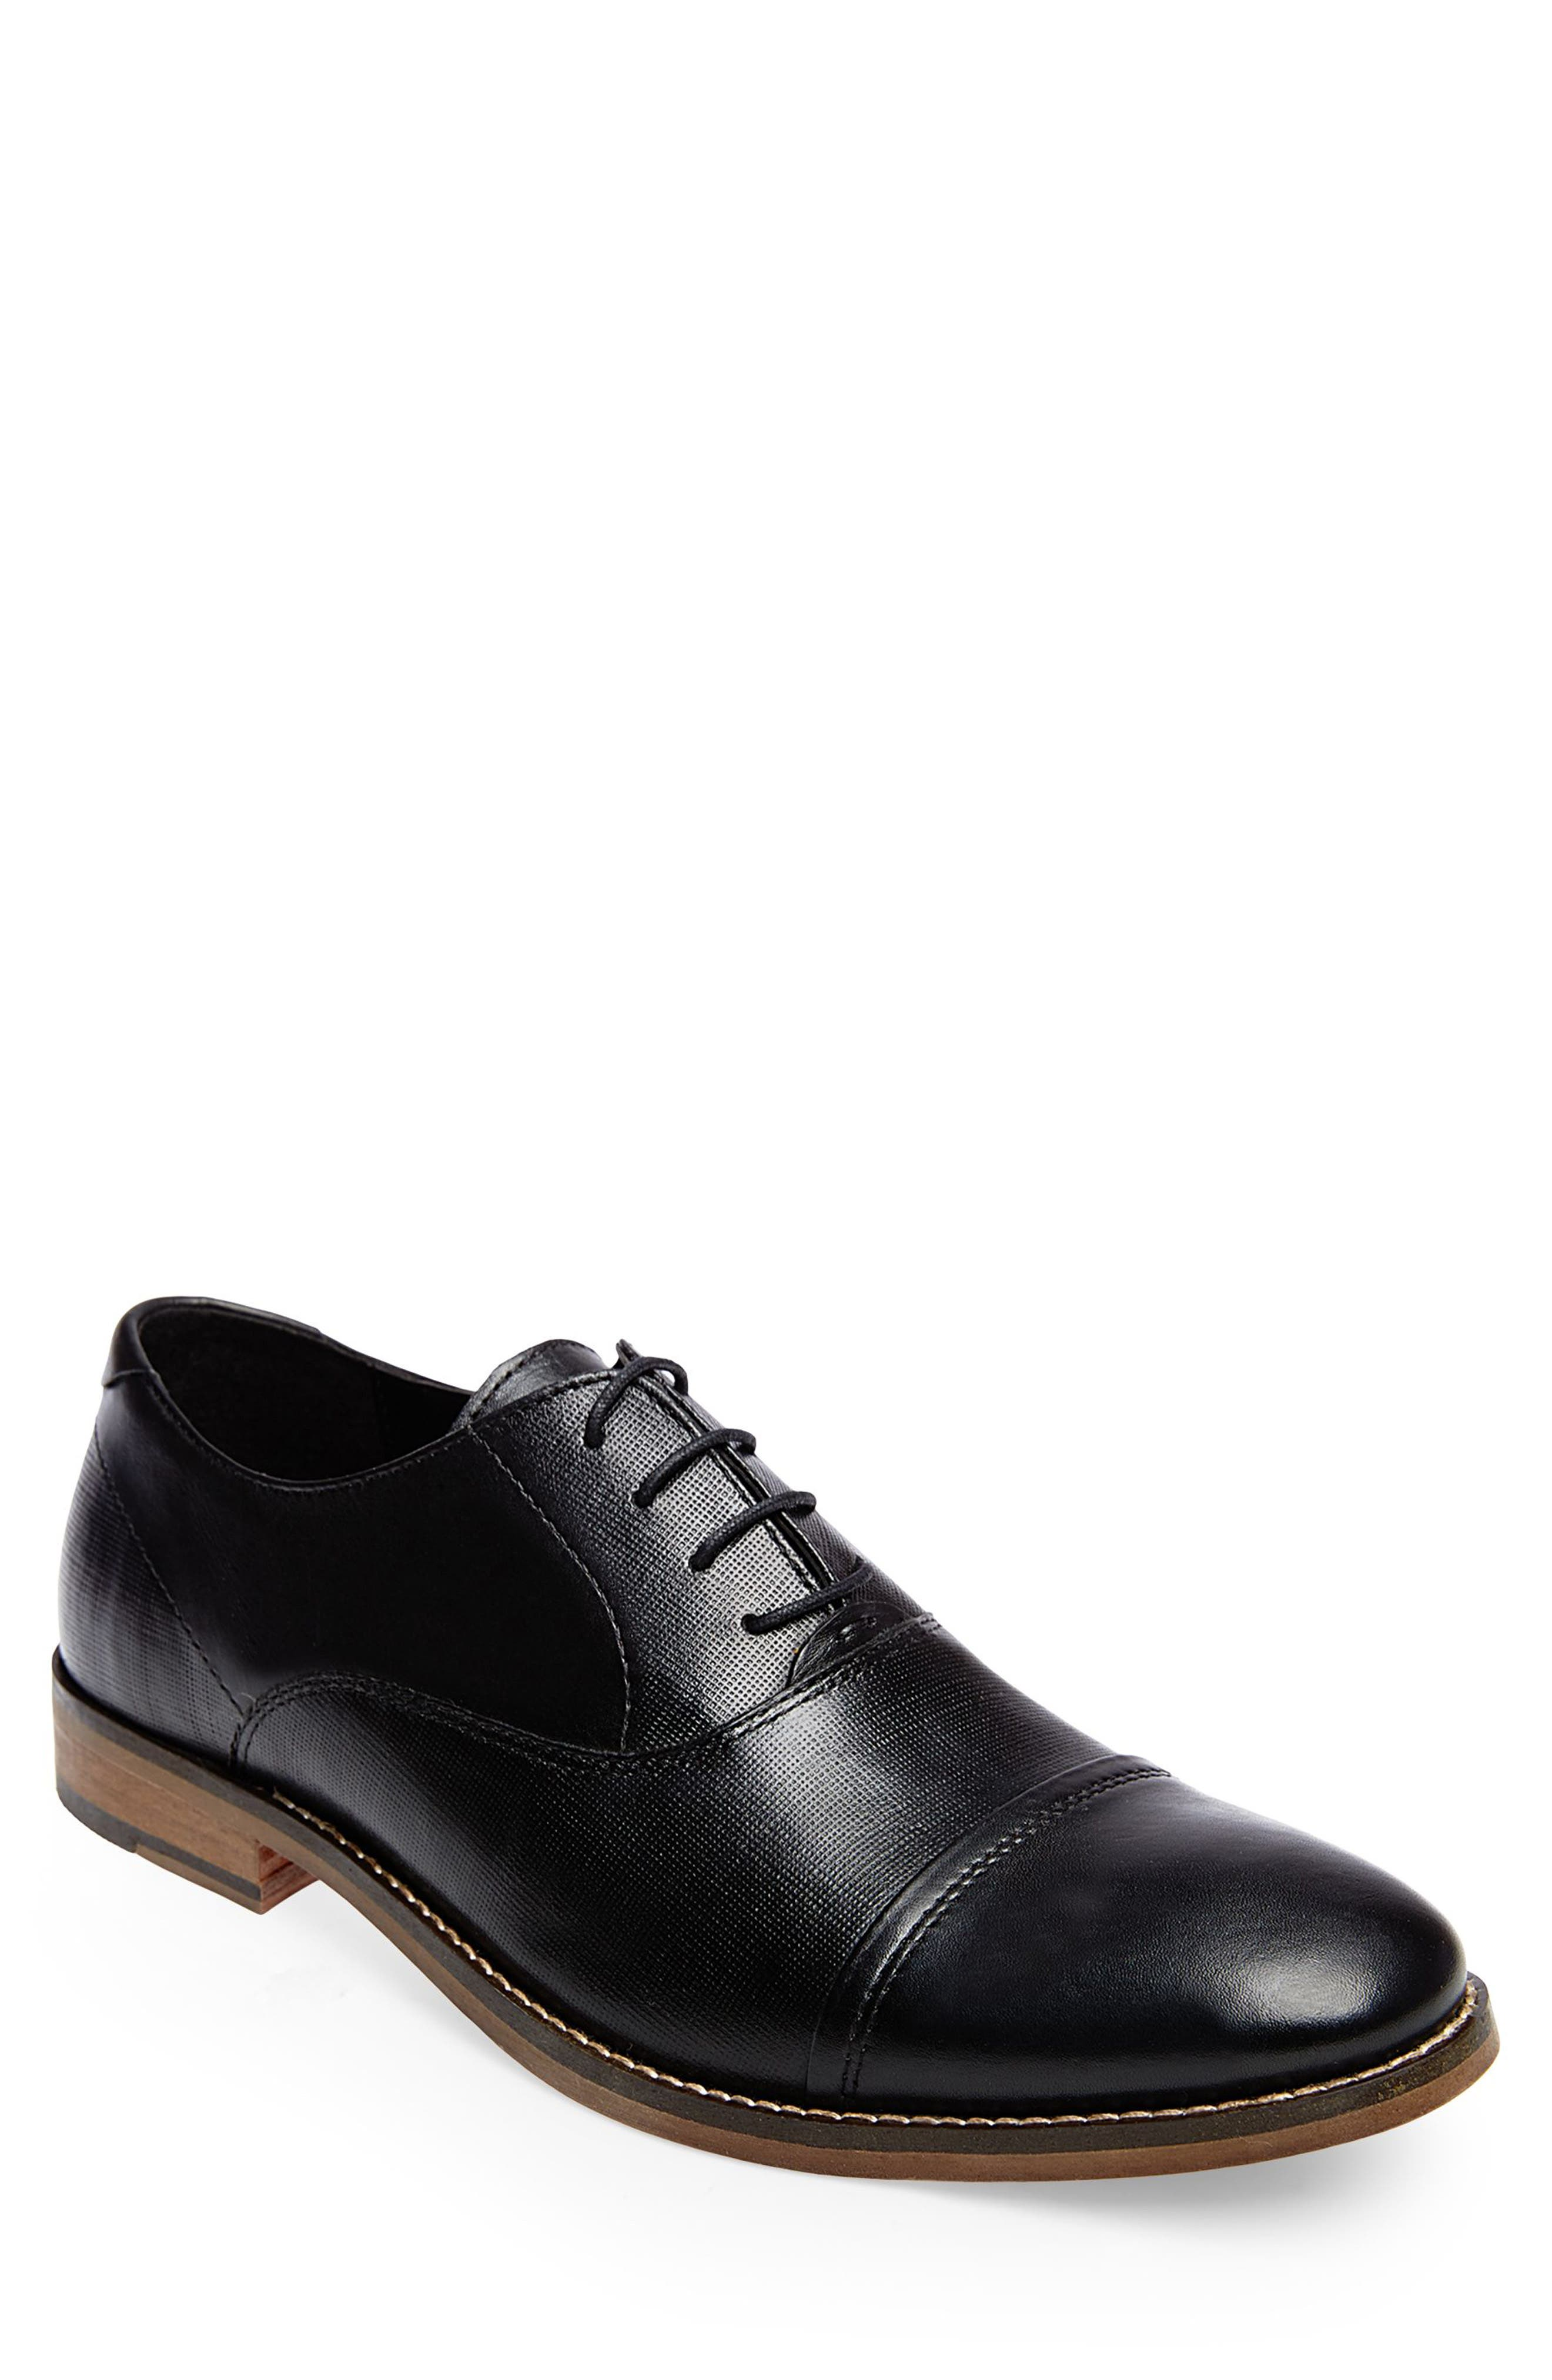 STEVE MADDEN Finnich Textured Cap Toe Oxford, Main, color, BLACK